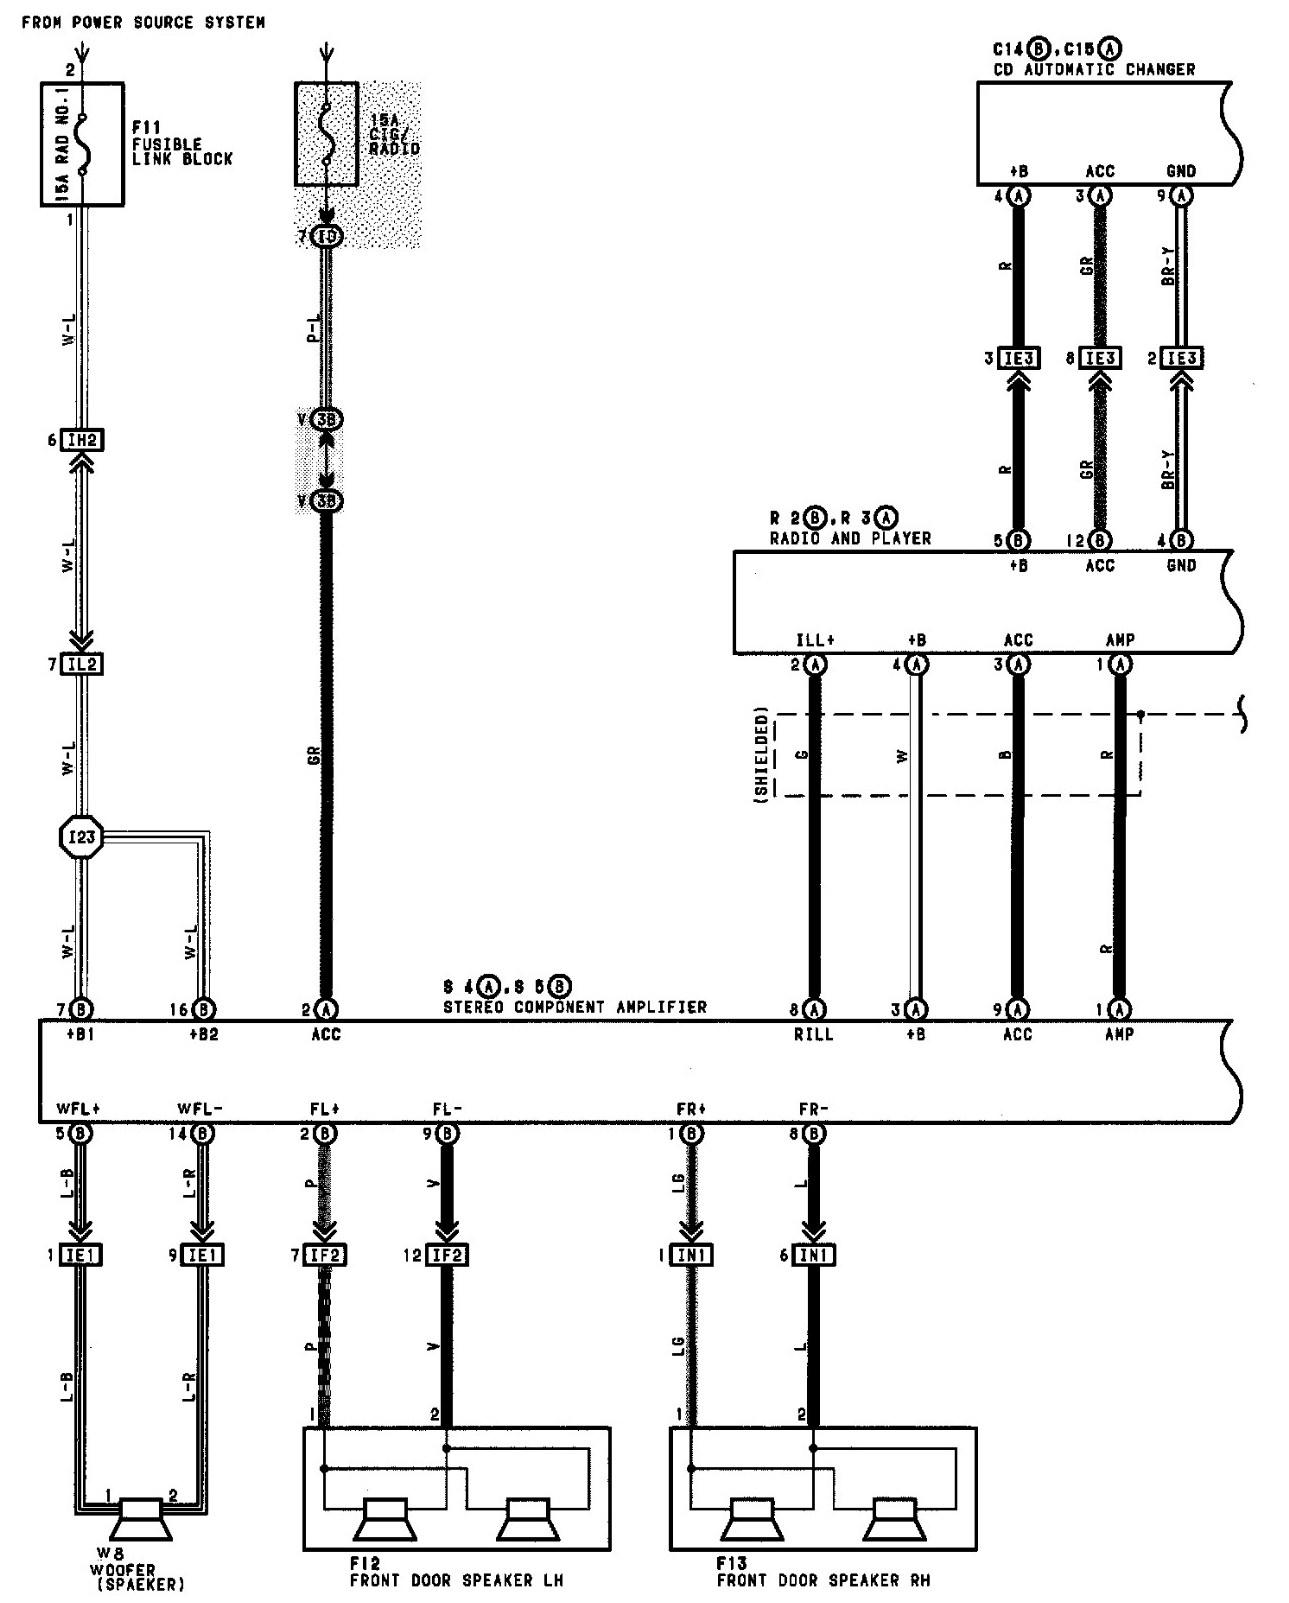 2009 Toyota Camry Radio Wiring Diagram